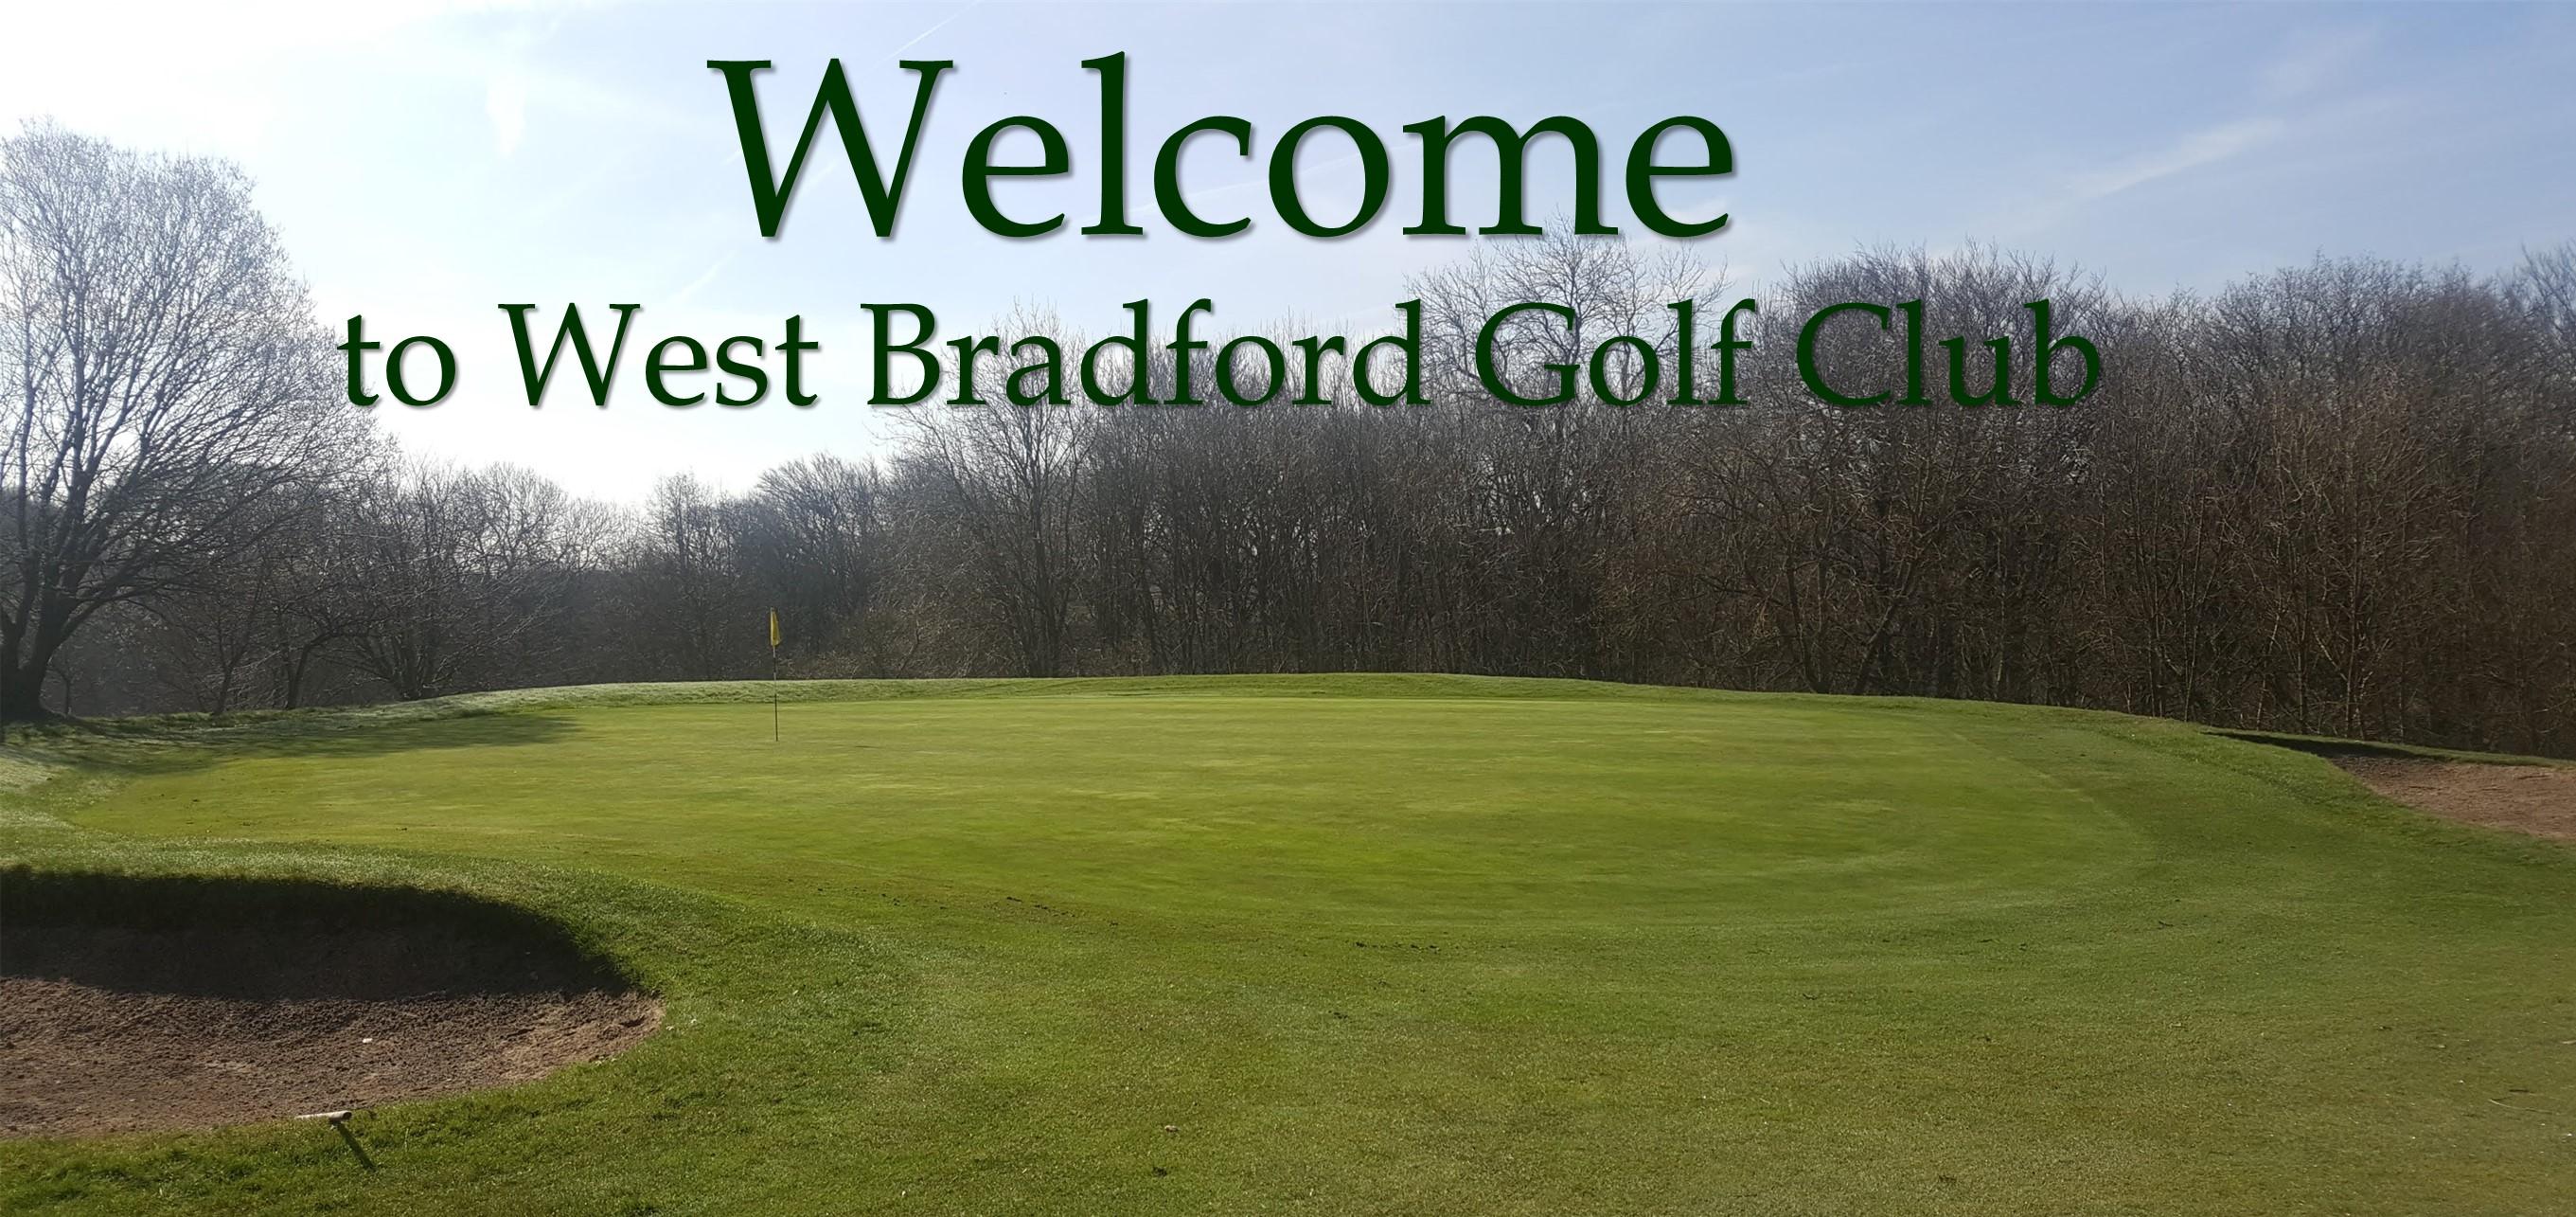 Welcome to West Bradford Golf Club